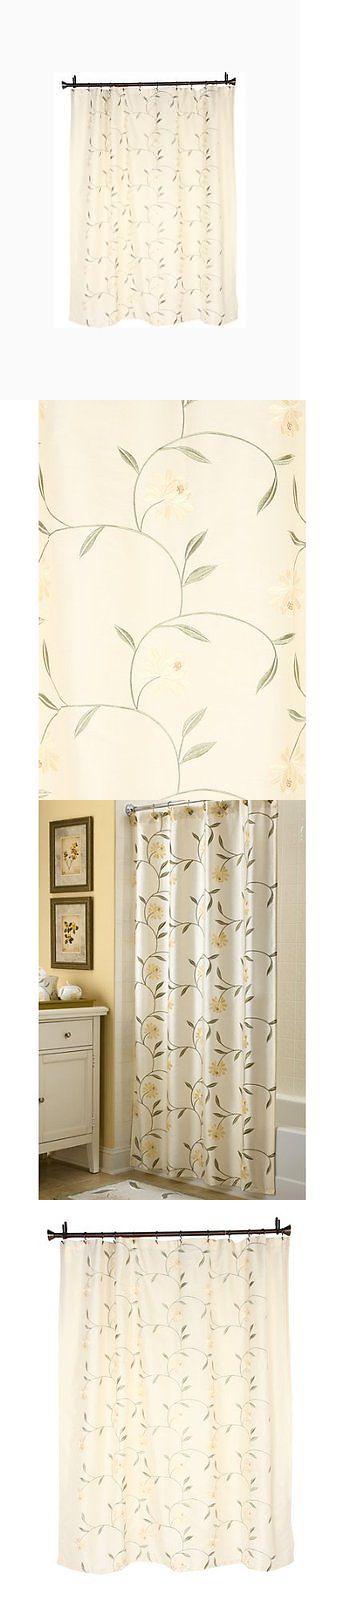 Shower Curtain Hooks 32874: Croscill Penelope Shower Curtain, New ...